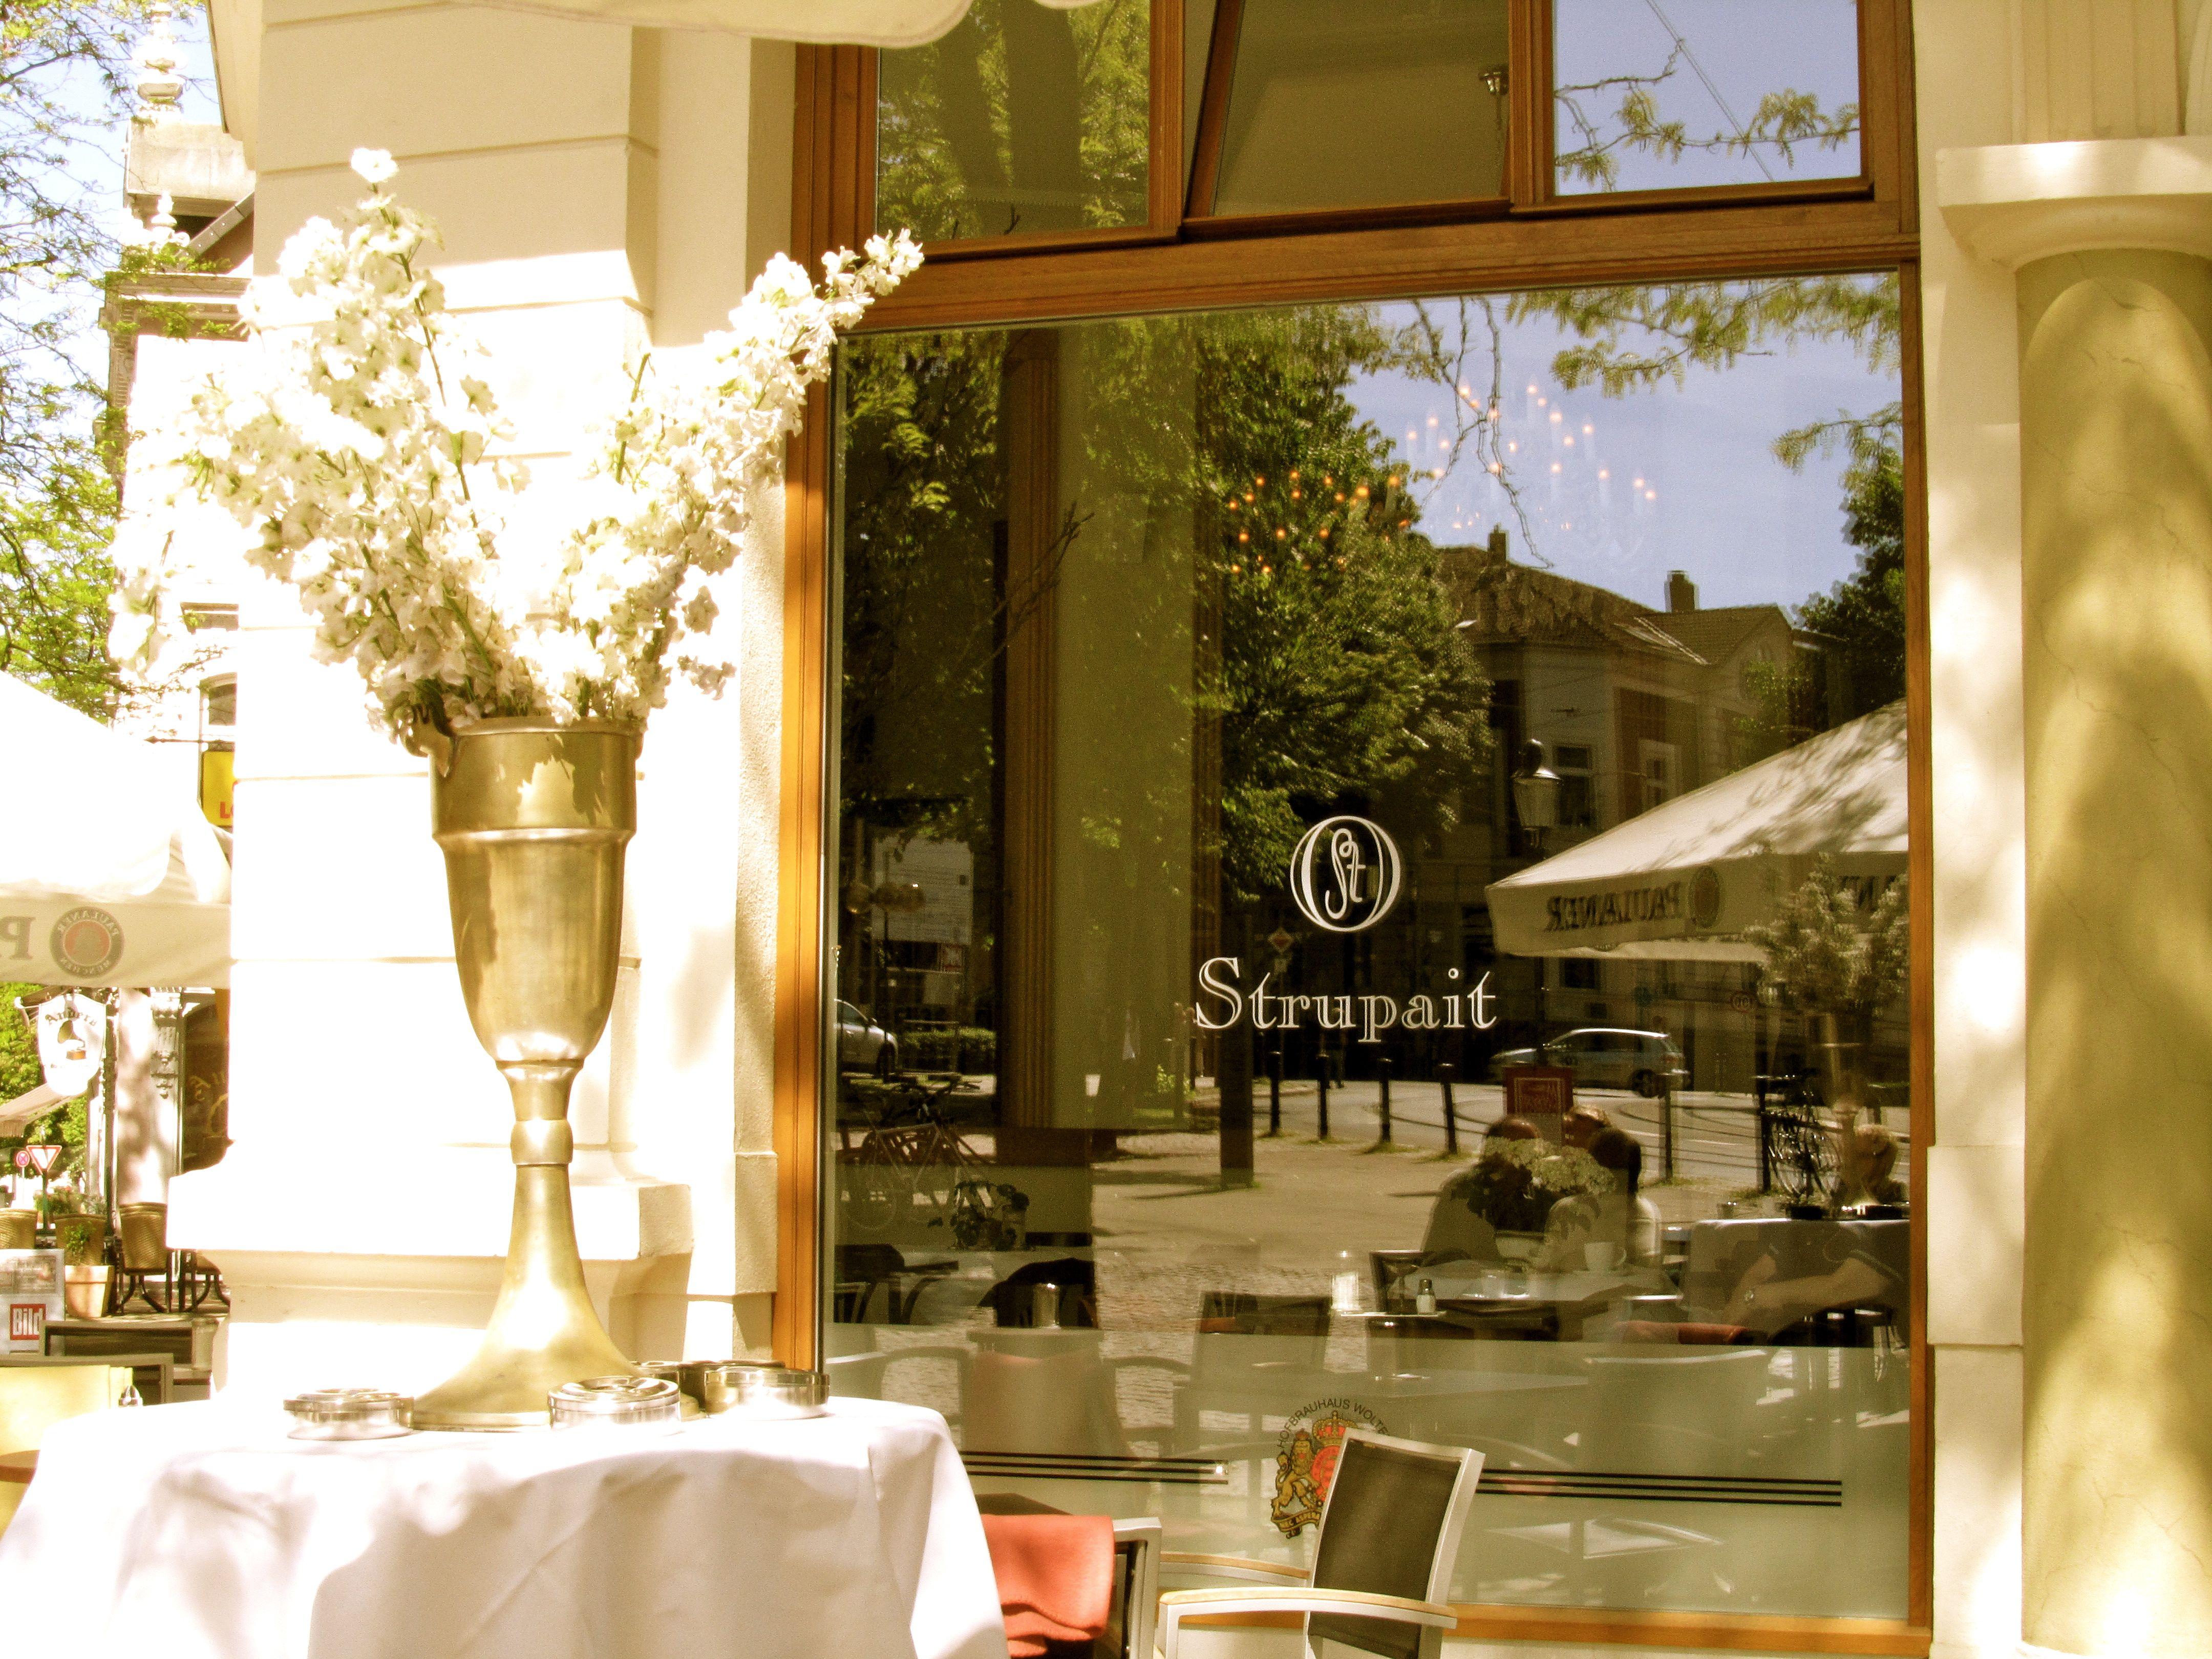 Einfach Mal Raus Heute Braunschweig Frühstück Im Lieblingscafé